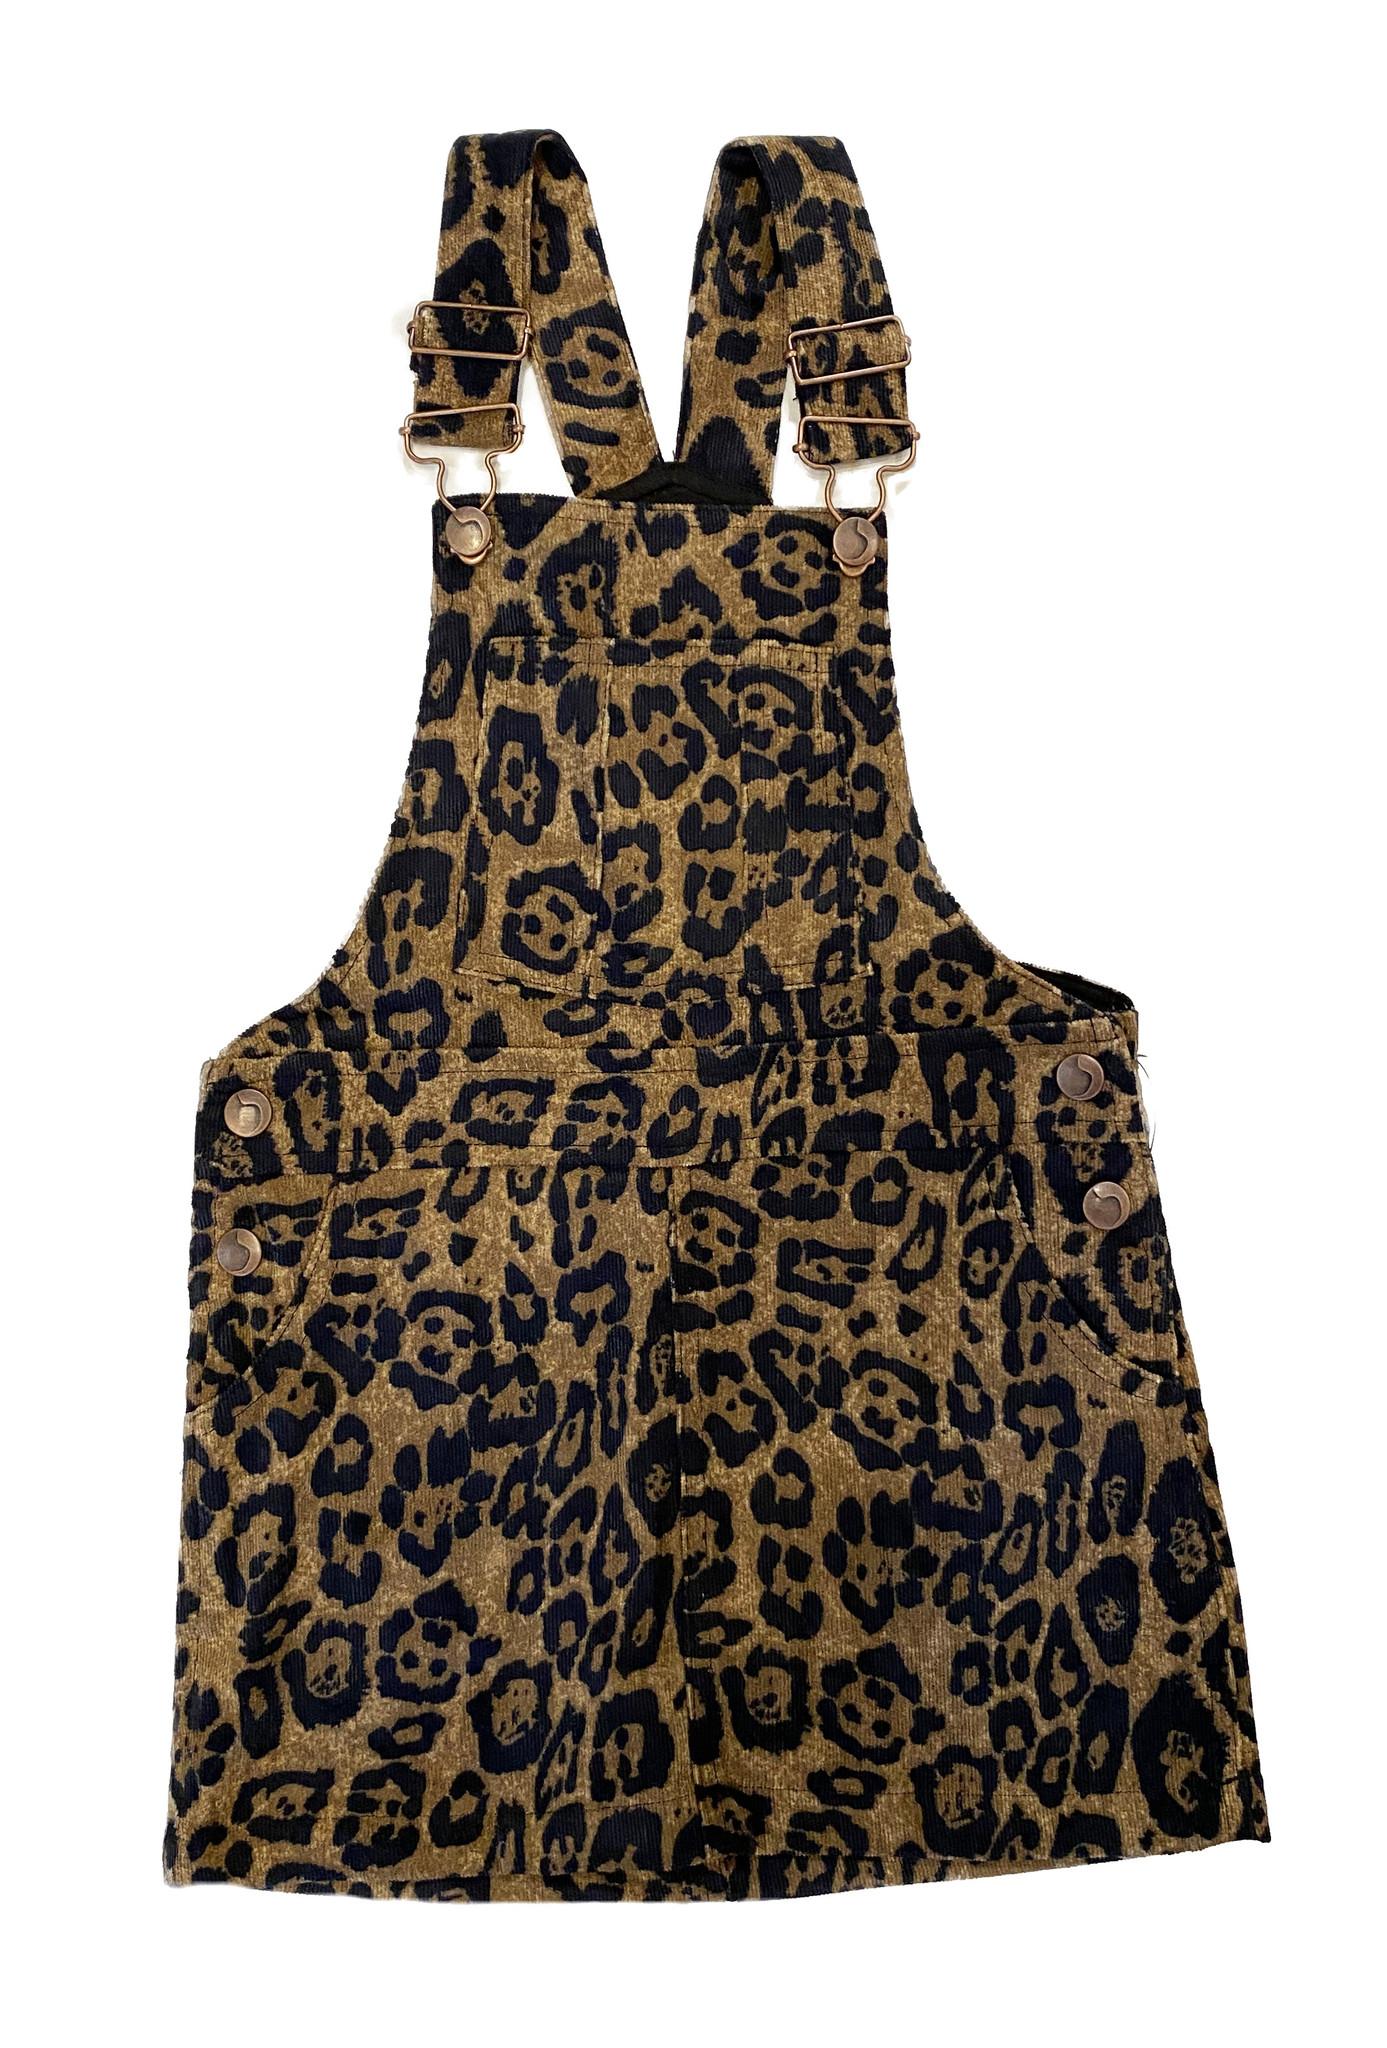 Joe's Cheetah Print Skirt-All Dress